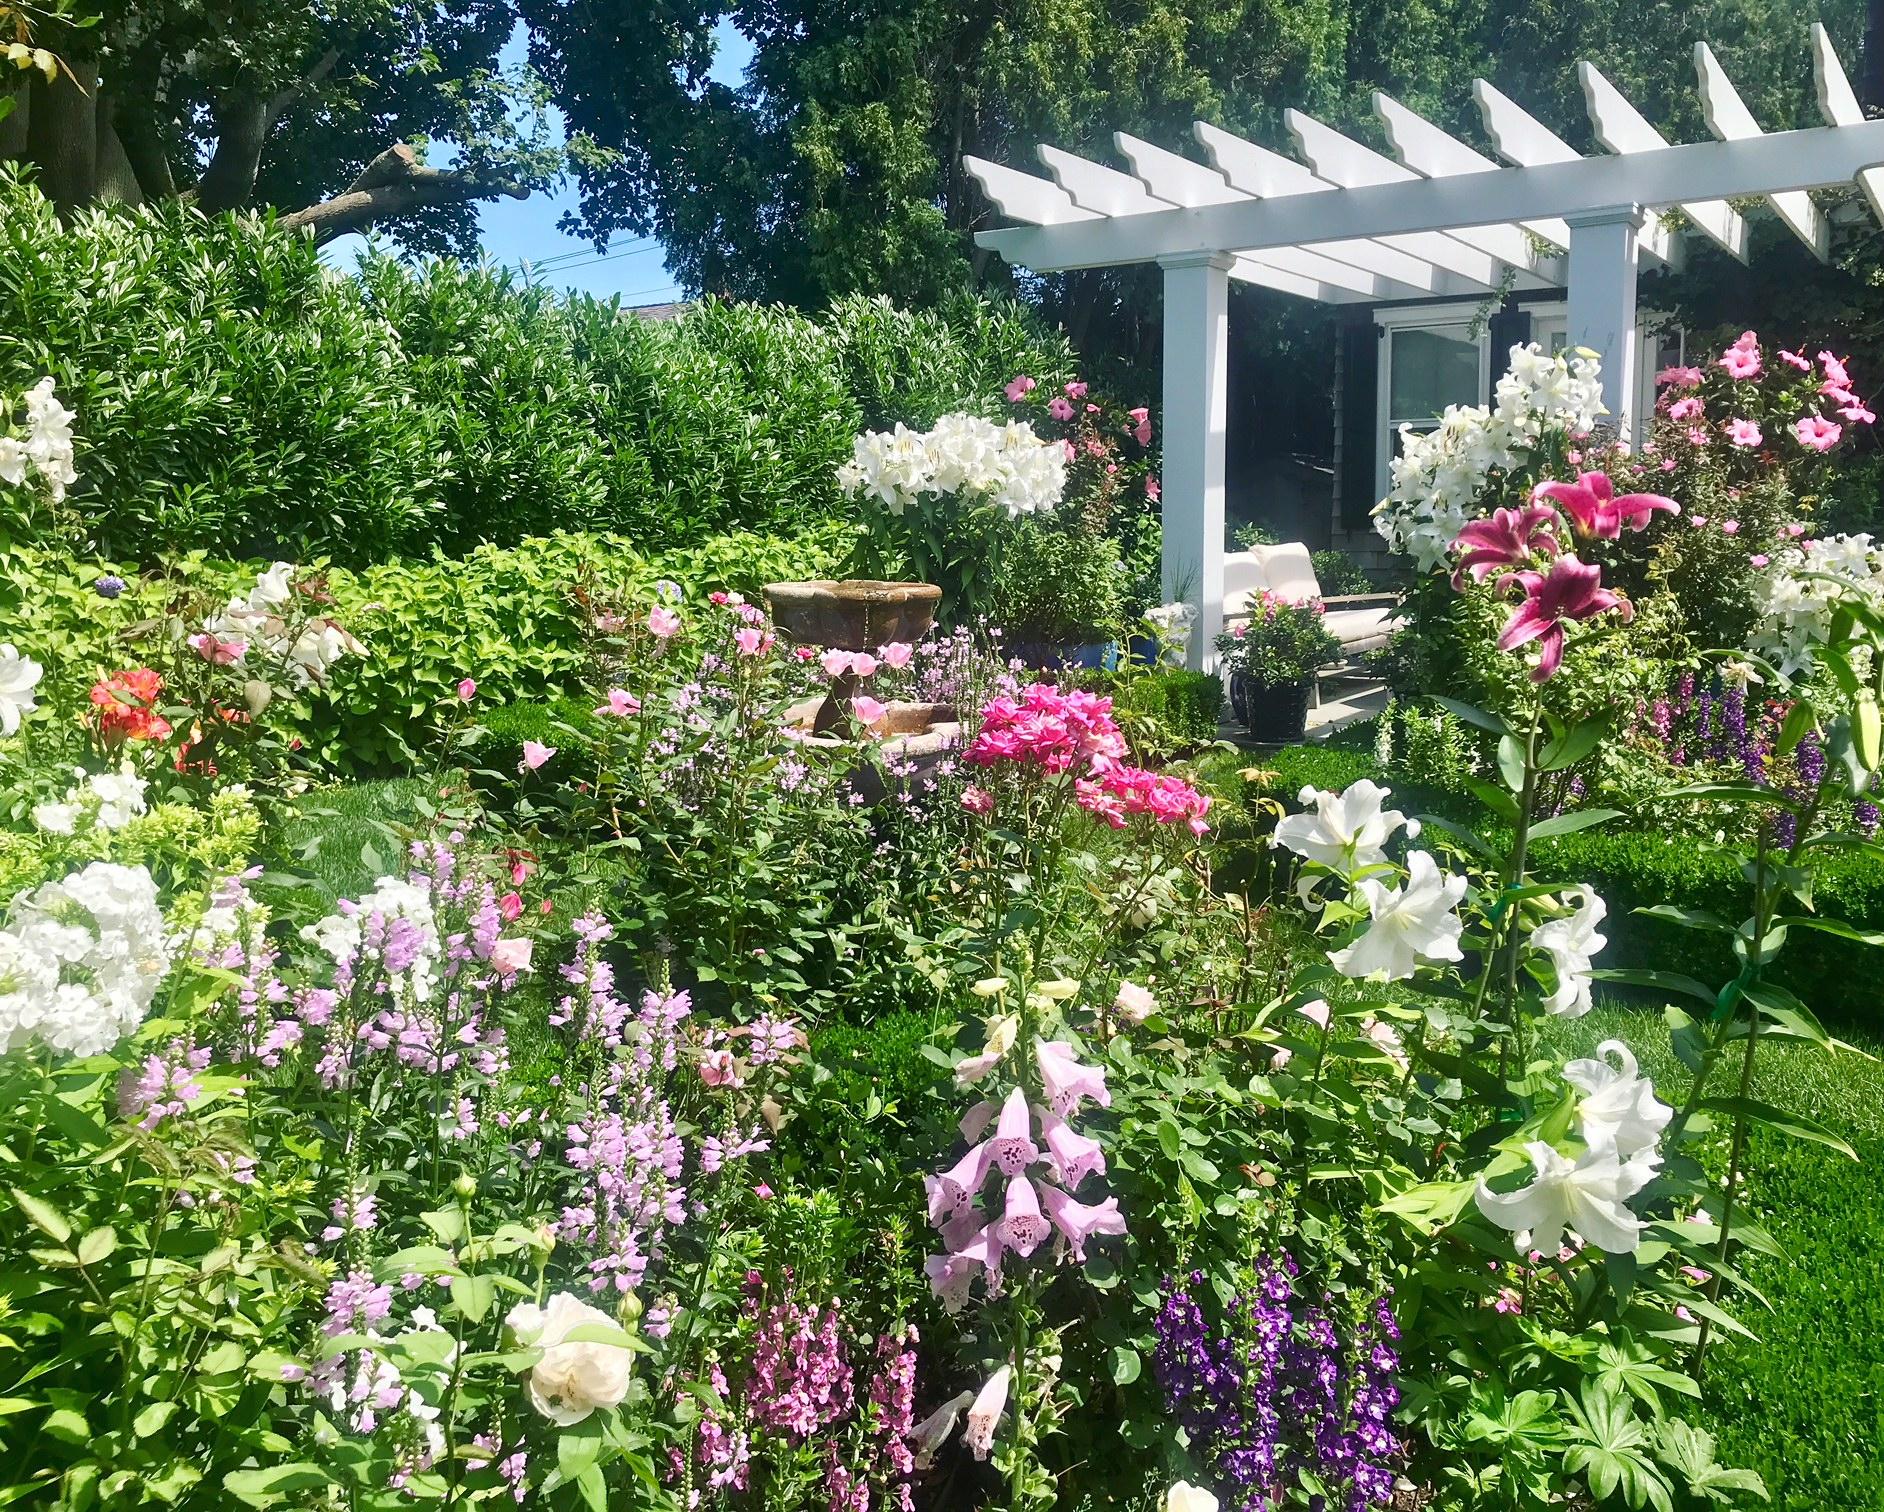 Pruning Roses 8 Easy Steps For Healthy Spring Rose Bushes